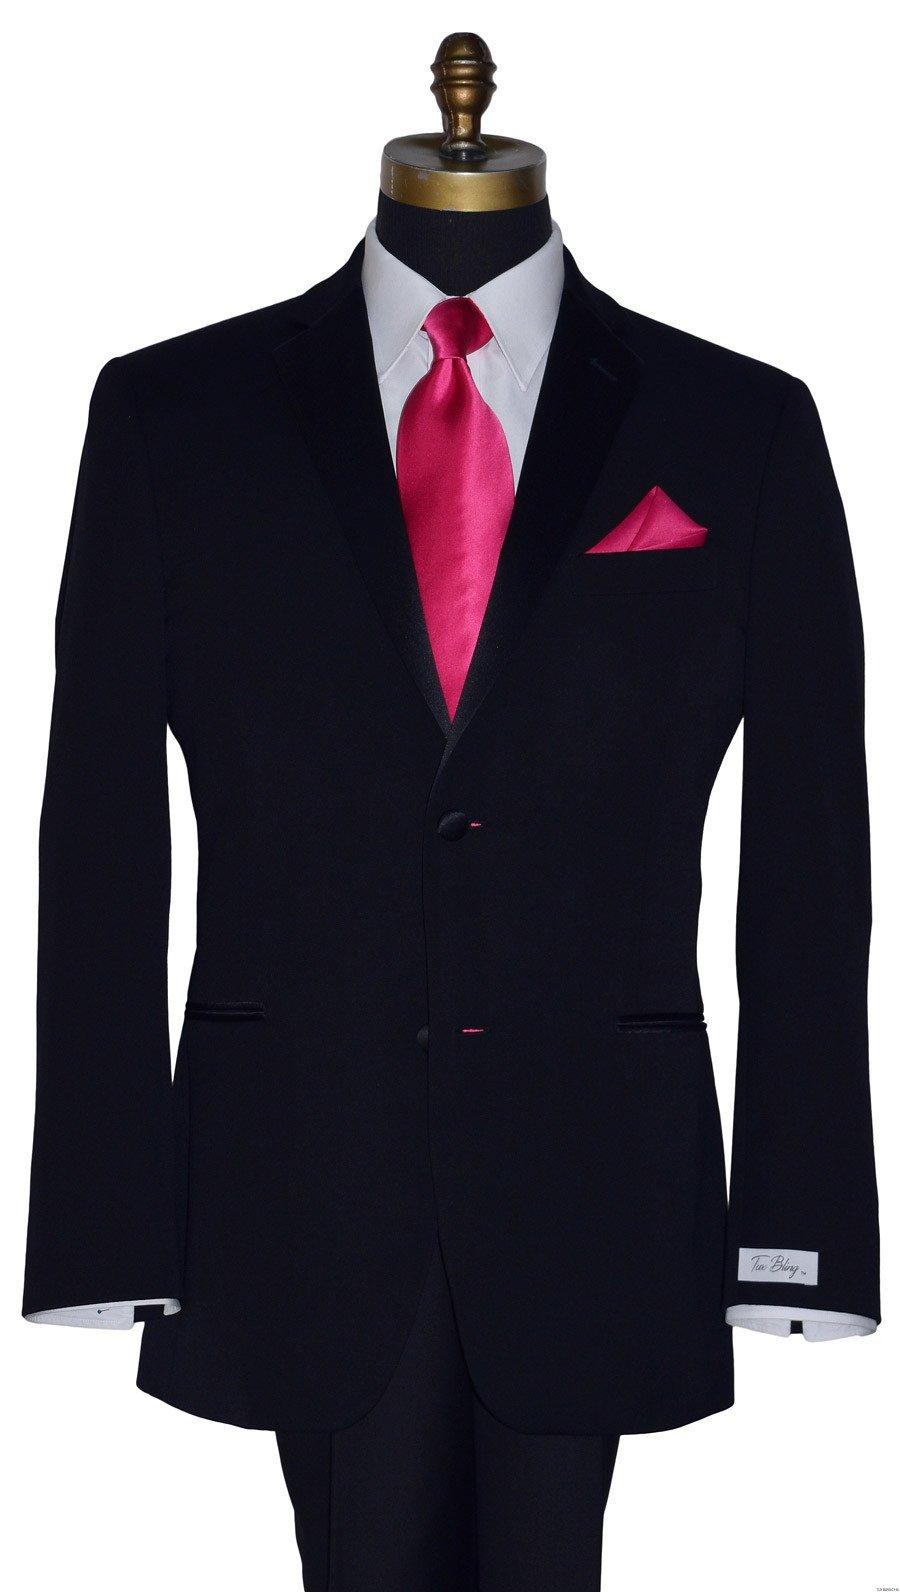 Tuxbling.com black tuxedo with hot pink silk long tie for men